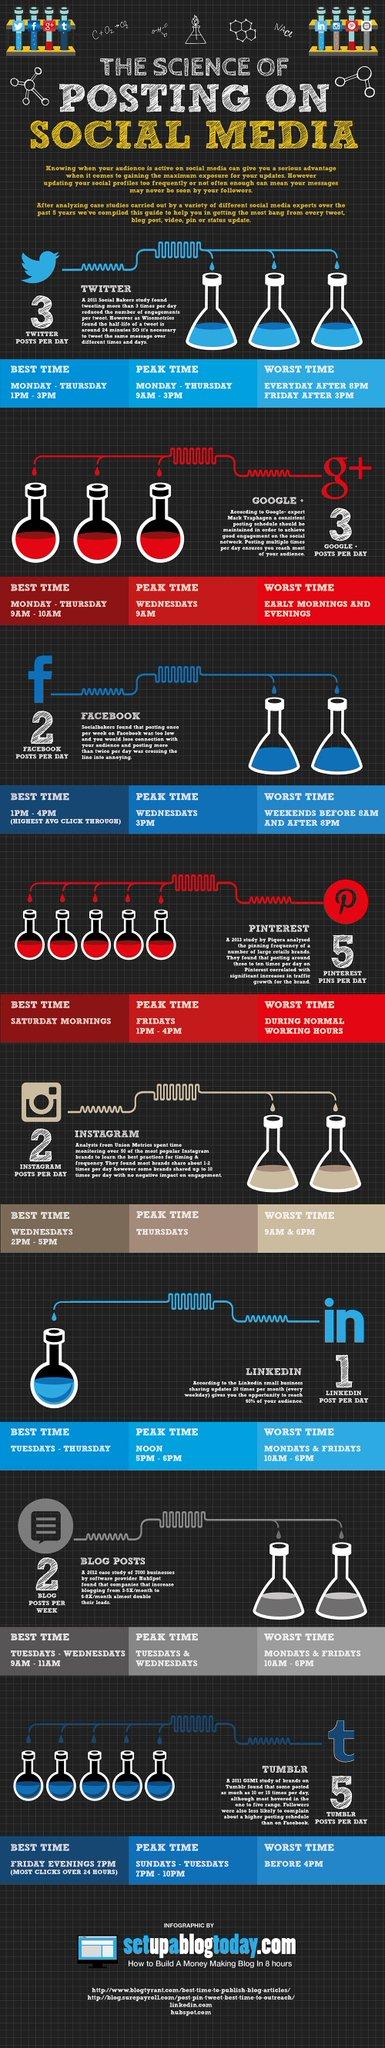 RT @Timothy_Hughes: The Science Behind Social Media Posting [INFOGRAPHIC] #smlondon http://t.co/WWj6TDKP7n #Socialselling #Socialmedia http…